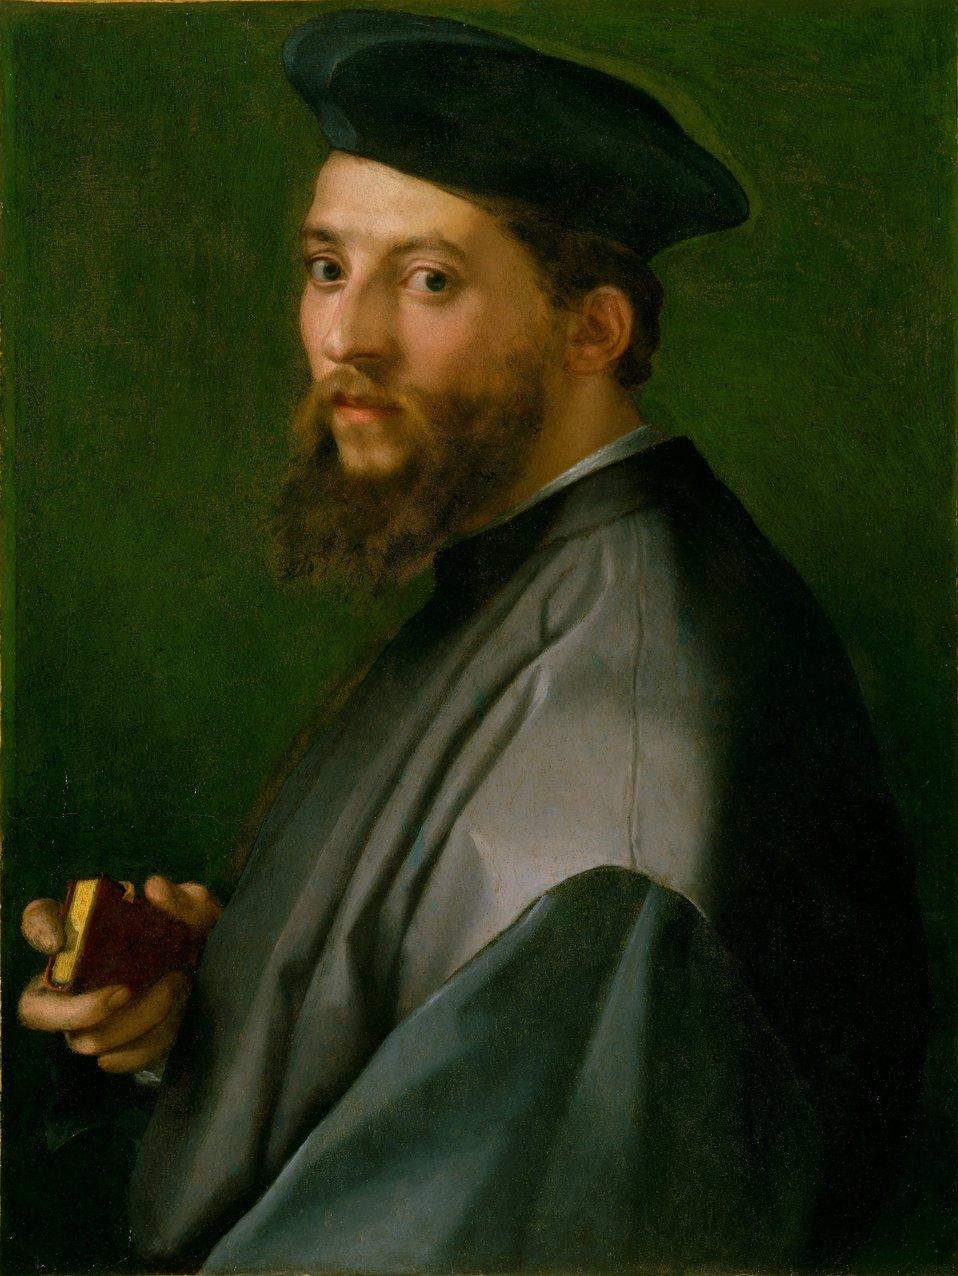 Andrea del Sarto - Ritratto di un uomo (MET Museum of Art, NYC).jpg